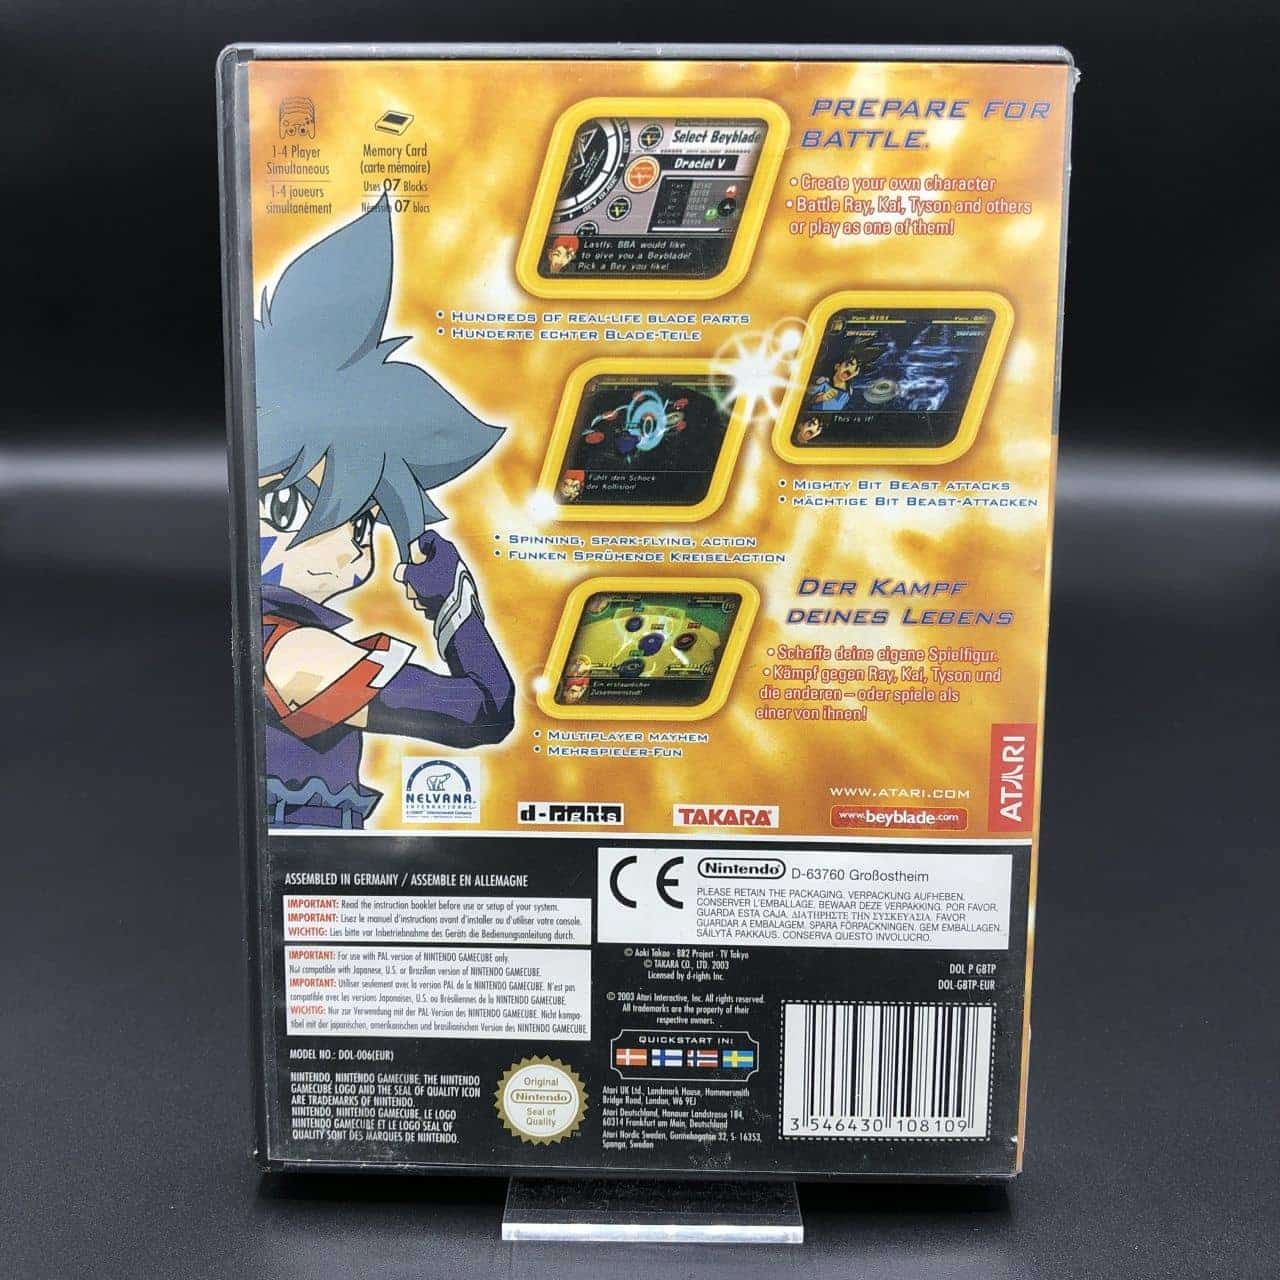 GC Beyblade VForce: Super Tournament Battle (Komplett) (Gebrauchsspuren) Nintendo GameCube